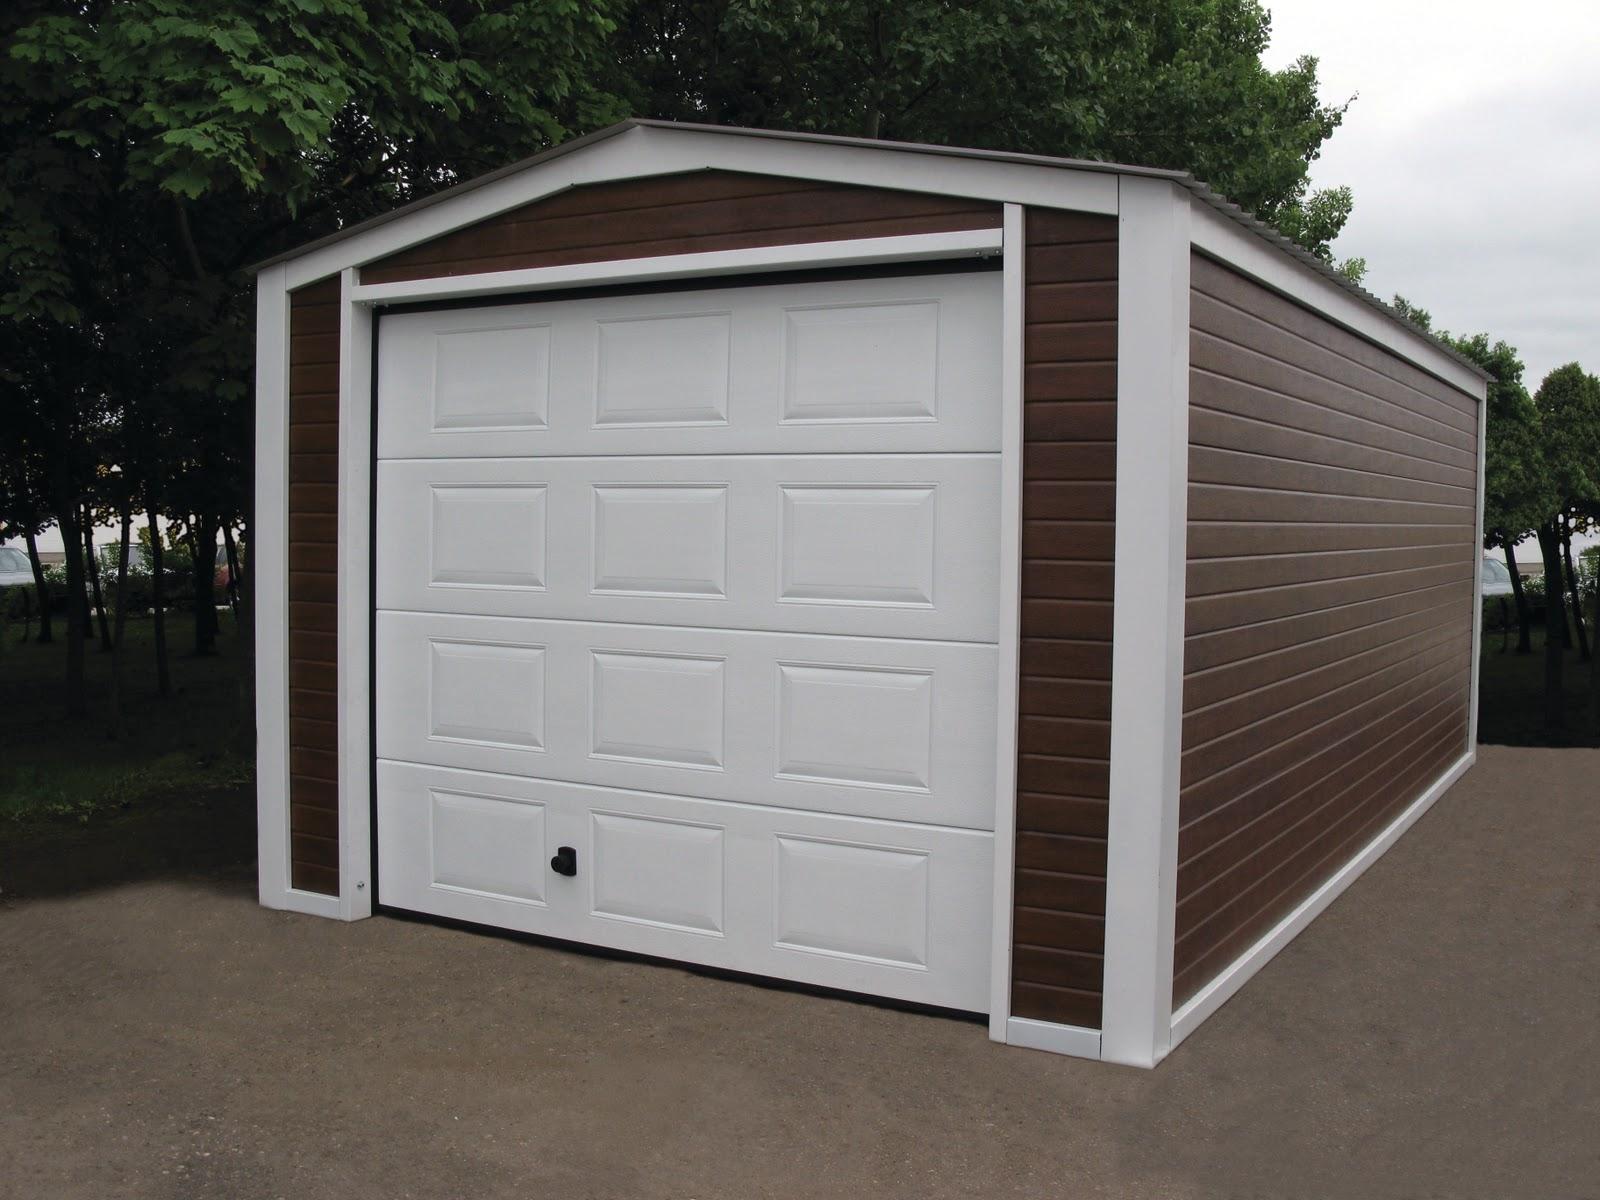 Diy garage or garden shed ryterna garage doors for Shed with garage door